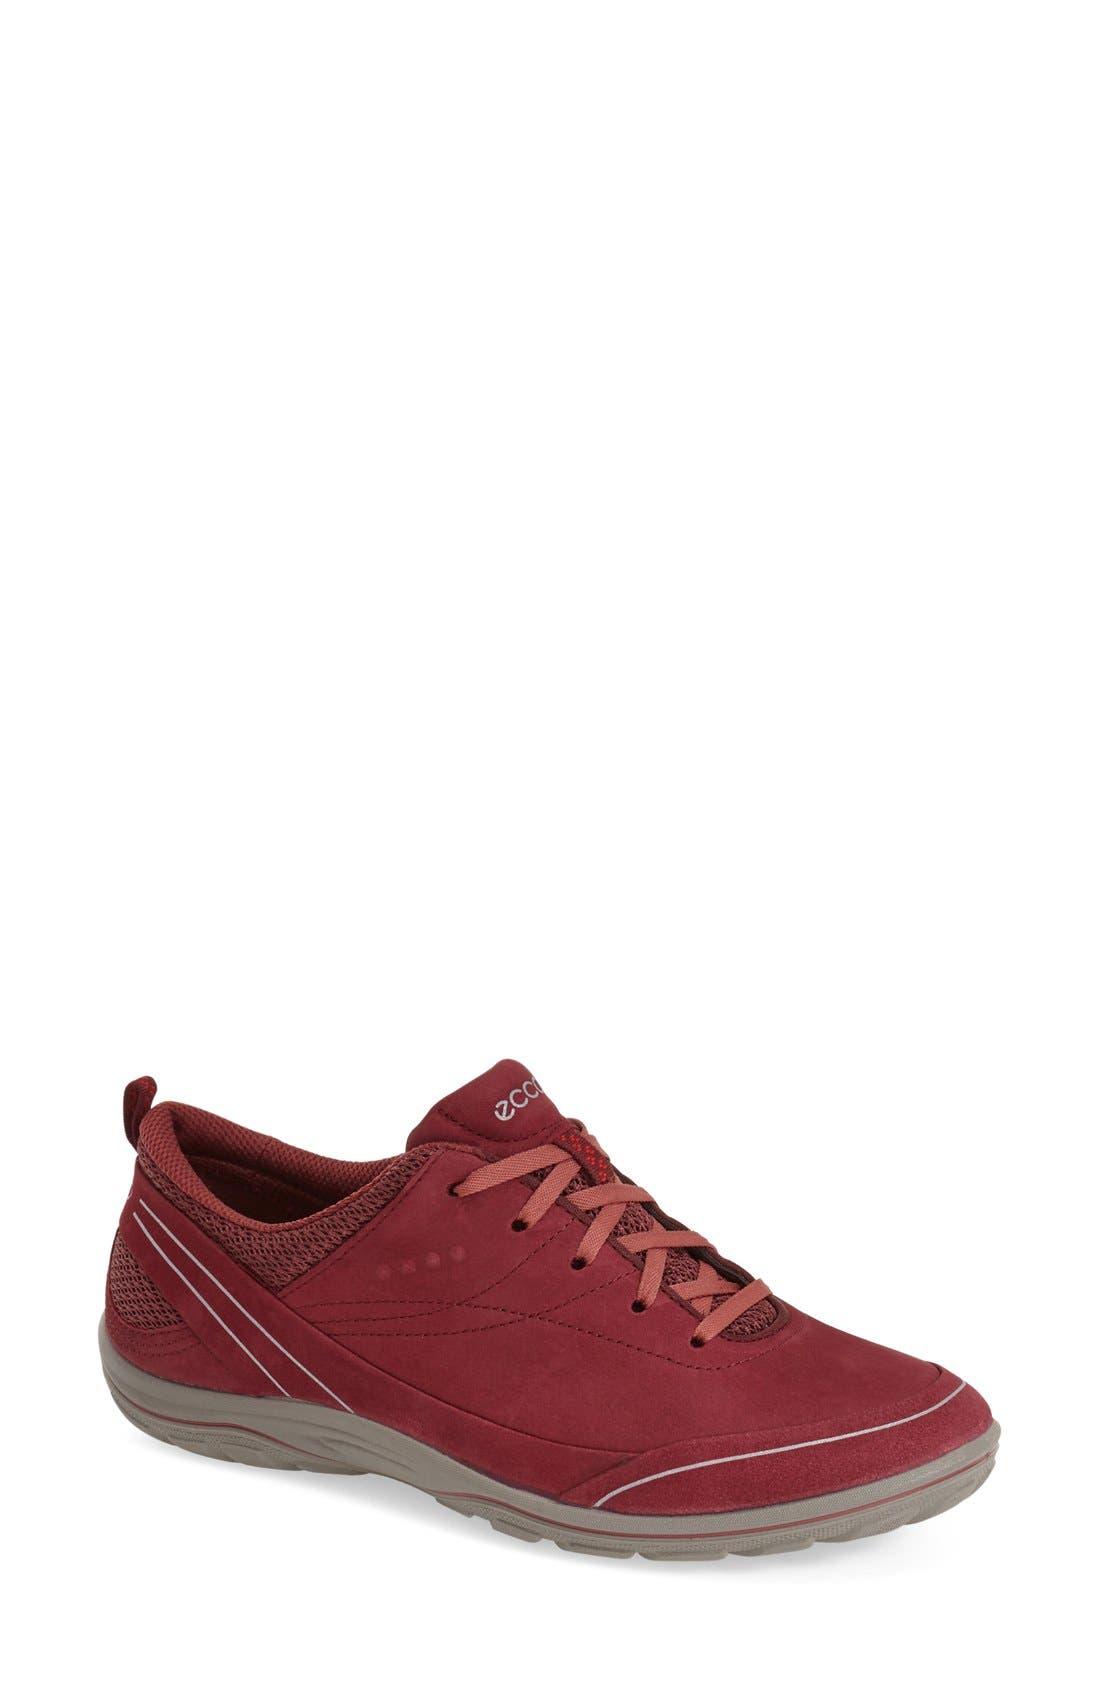 Alternate Image 1 Selected - ECCO'Arizona' Sneaker (Women)